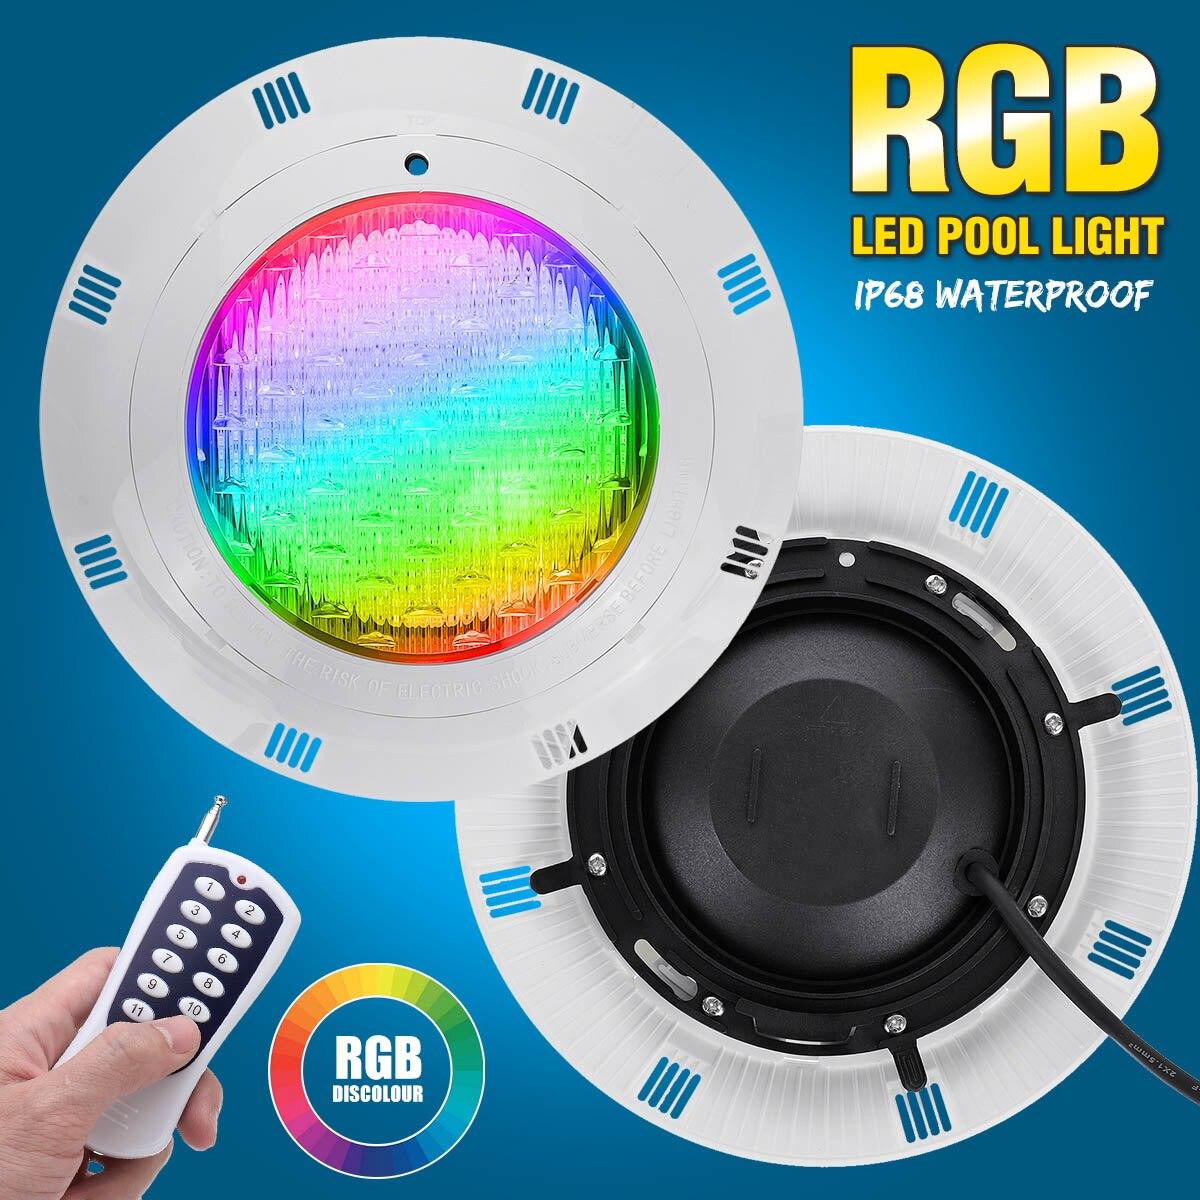 45W RGB LED ว่ายน้ำสระว่ายน้ำ 450LED IP68 กันน้ำ AC/DC12V-24V กลางแจ้ง RGB ใต้น้ำ Pond LED Piscina luz Spotlight